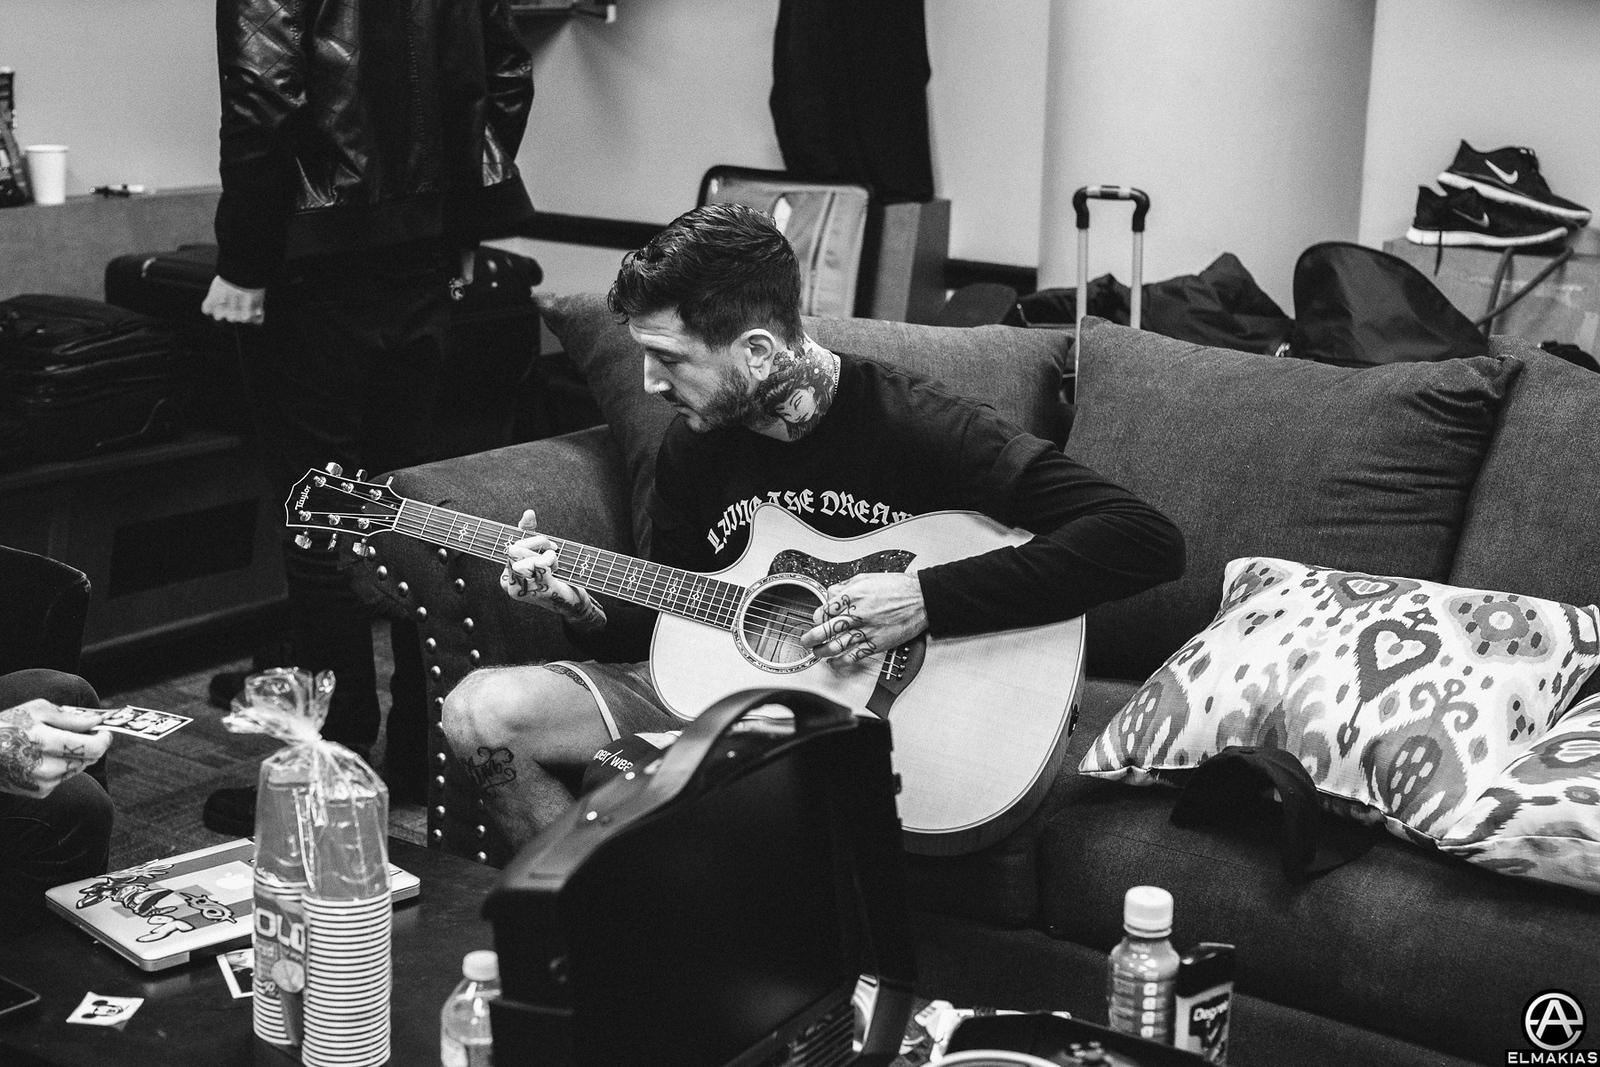 Austin practicing his acoustic guitar backstage